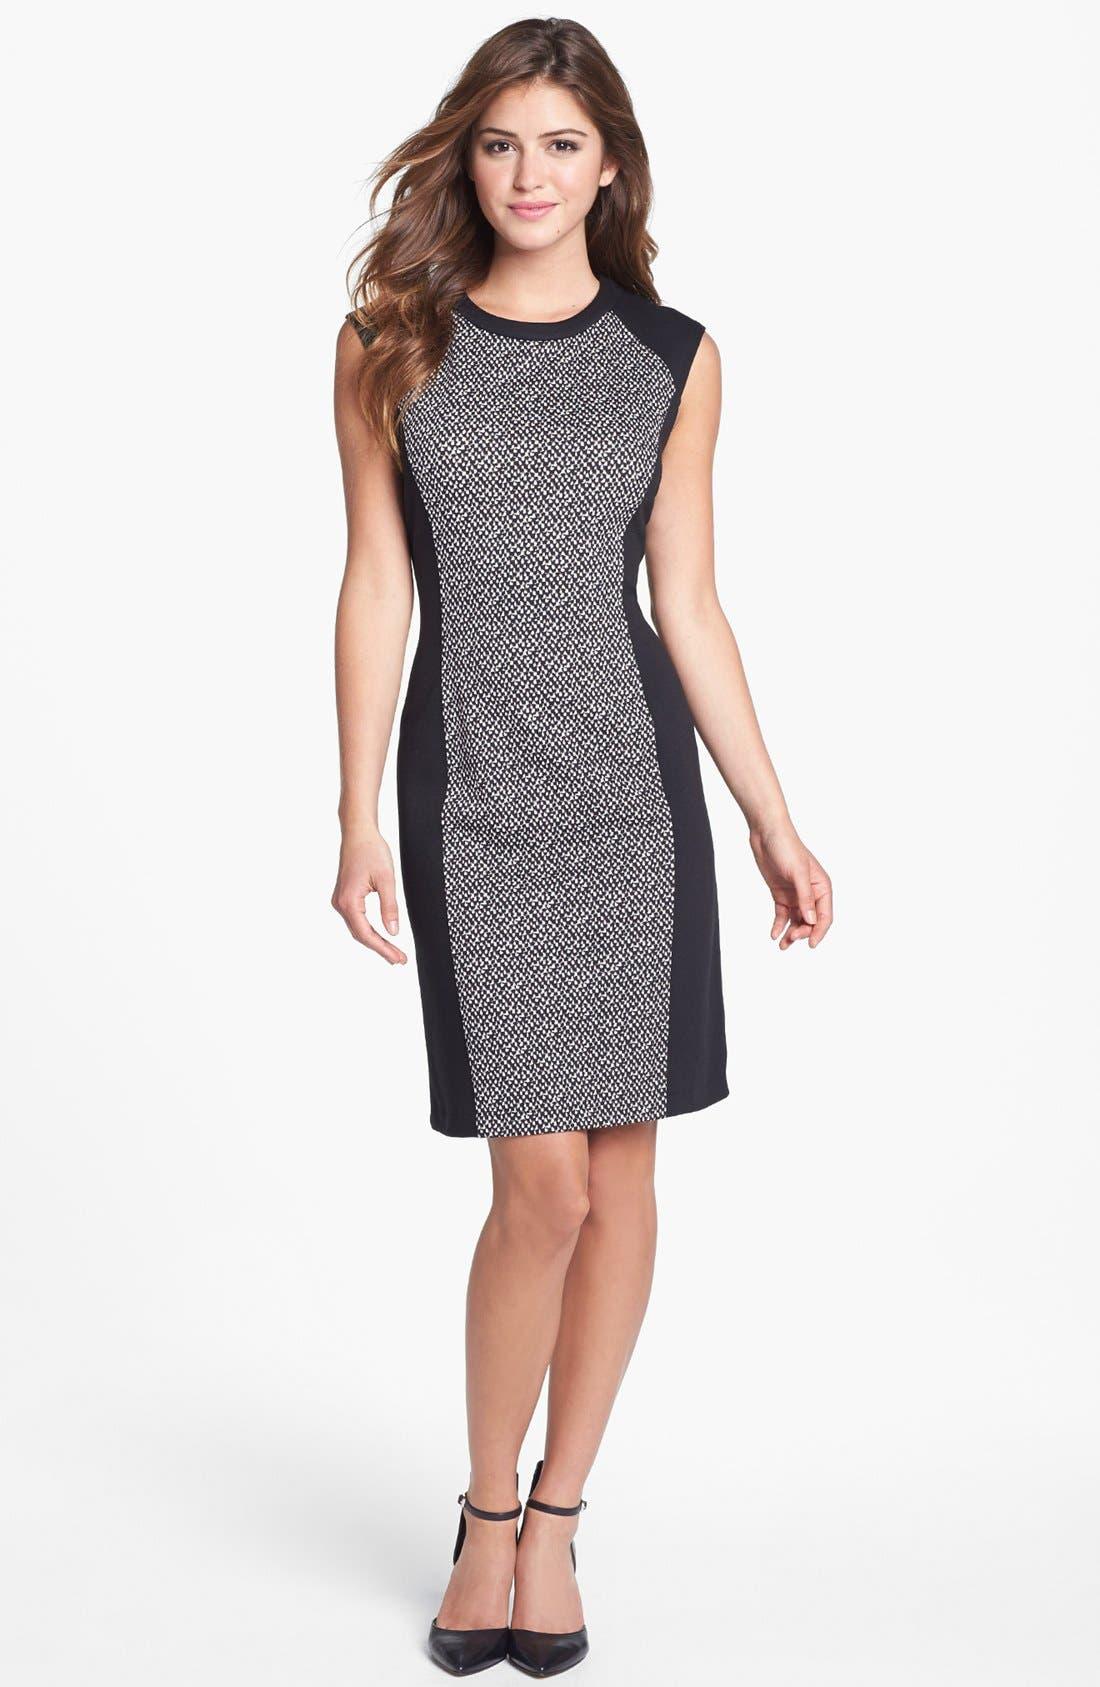 Alternate Image 1 Selected - Calvin Klein Colorblock Print Ponte Knit Dress (Online Only)